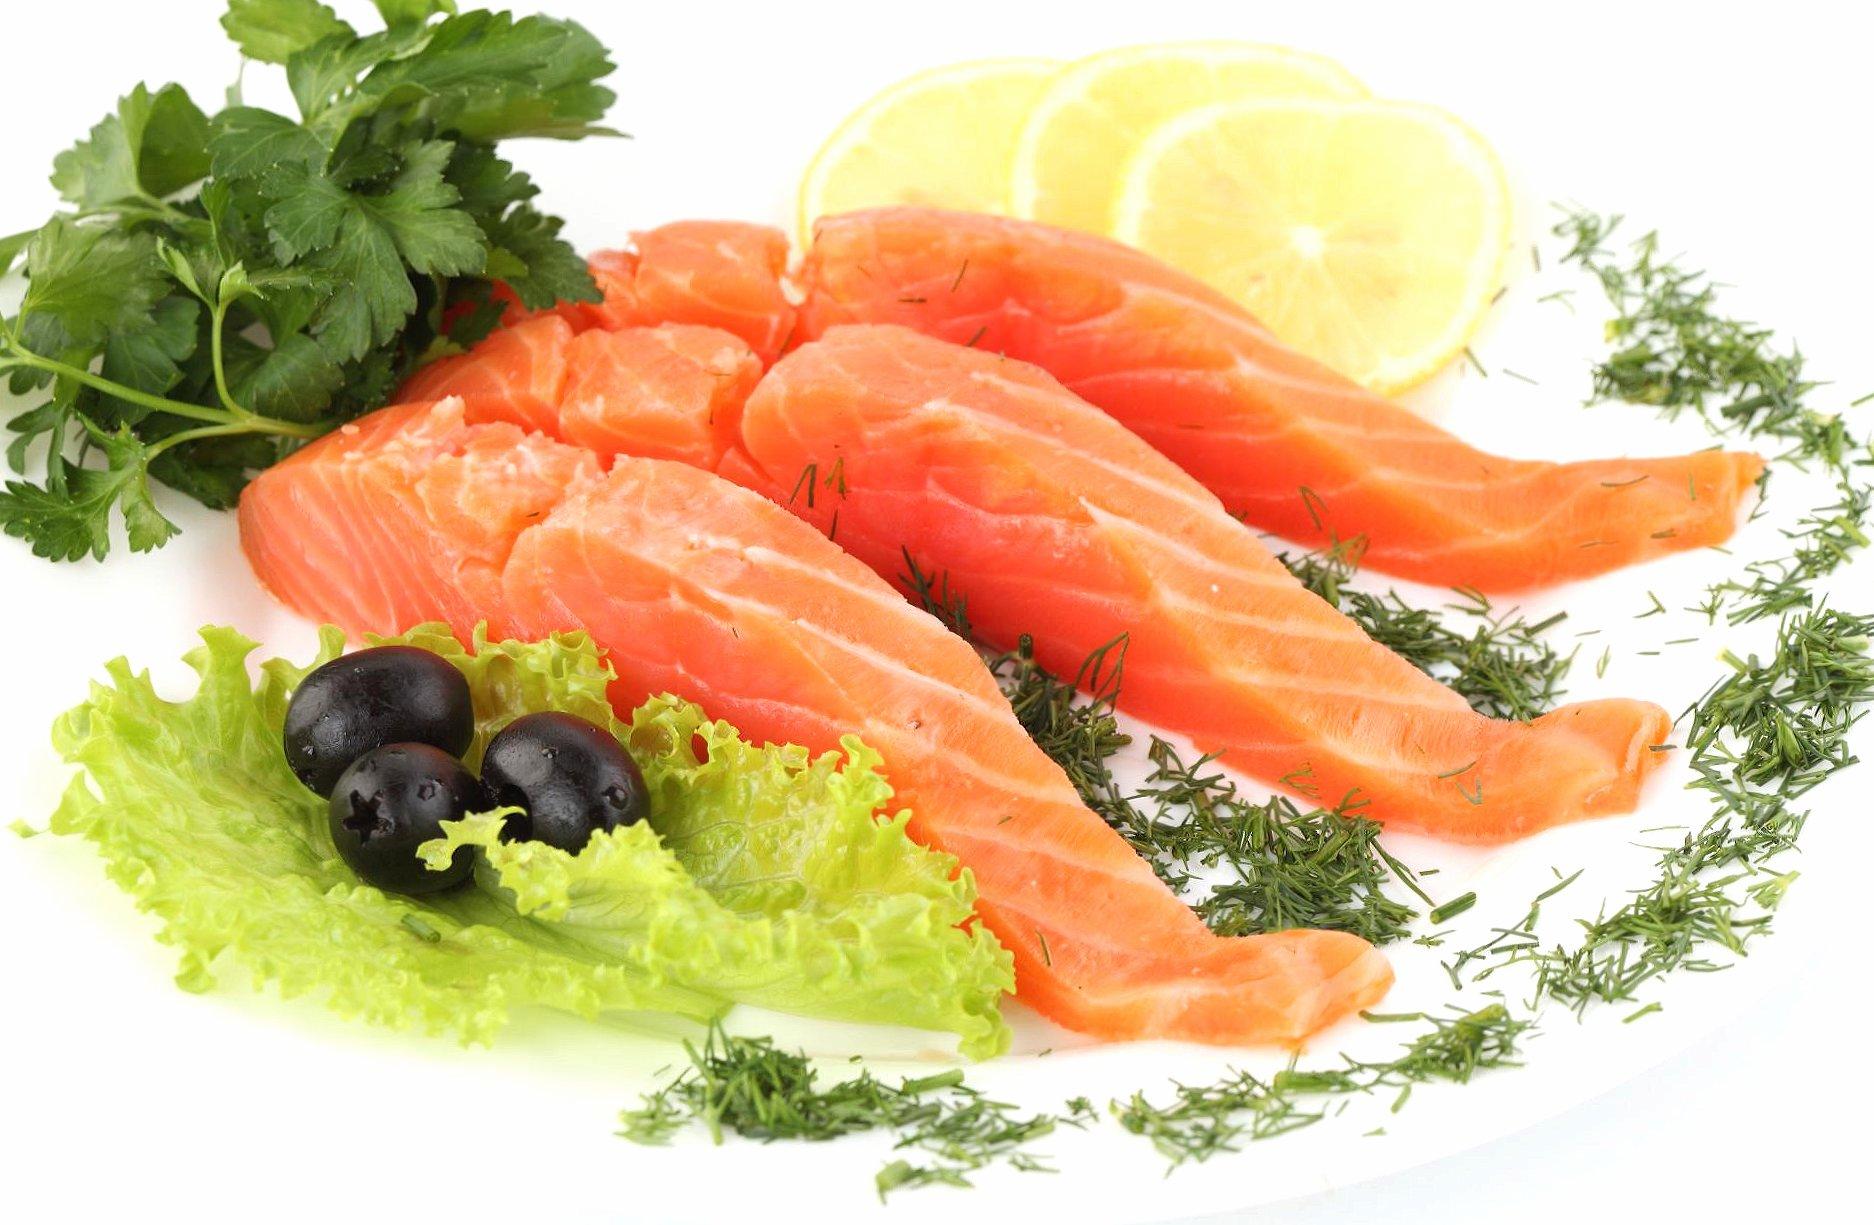 Sliced salmon fish food wallpapers HD quality